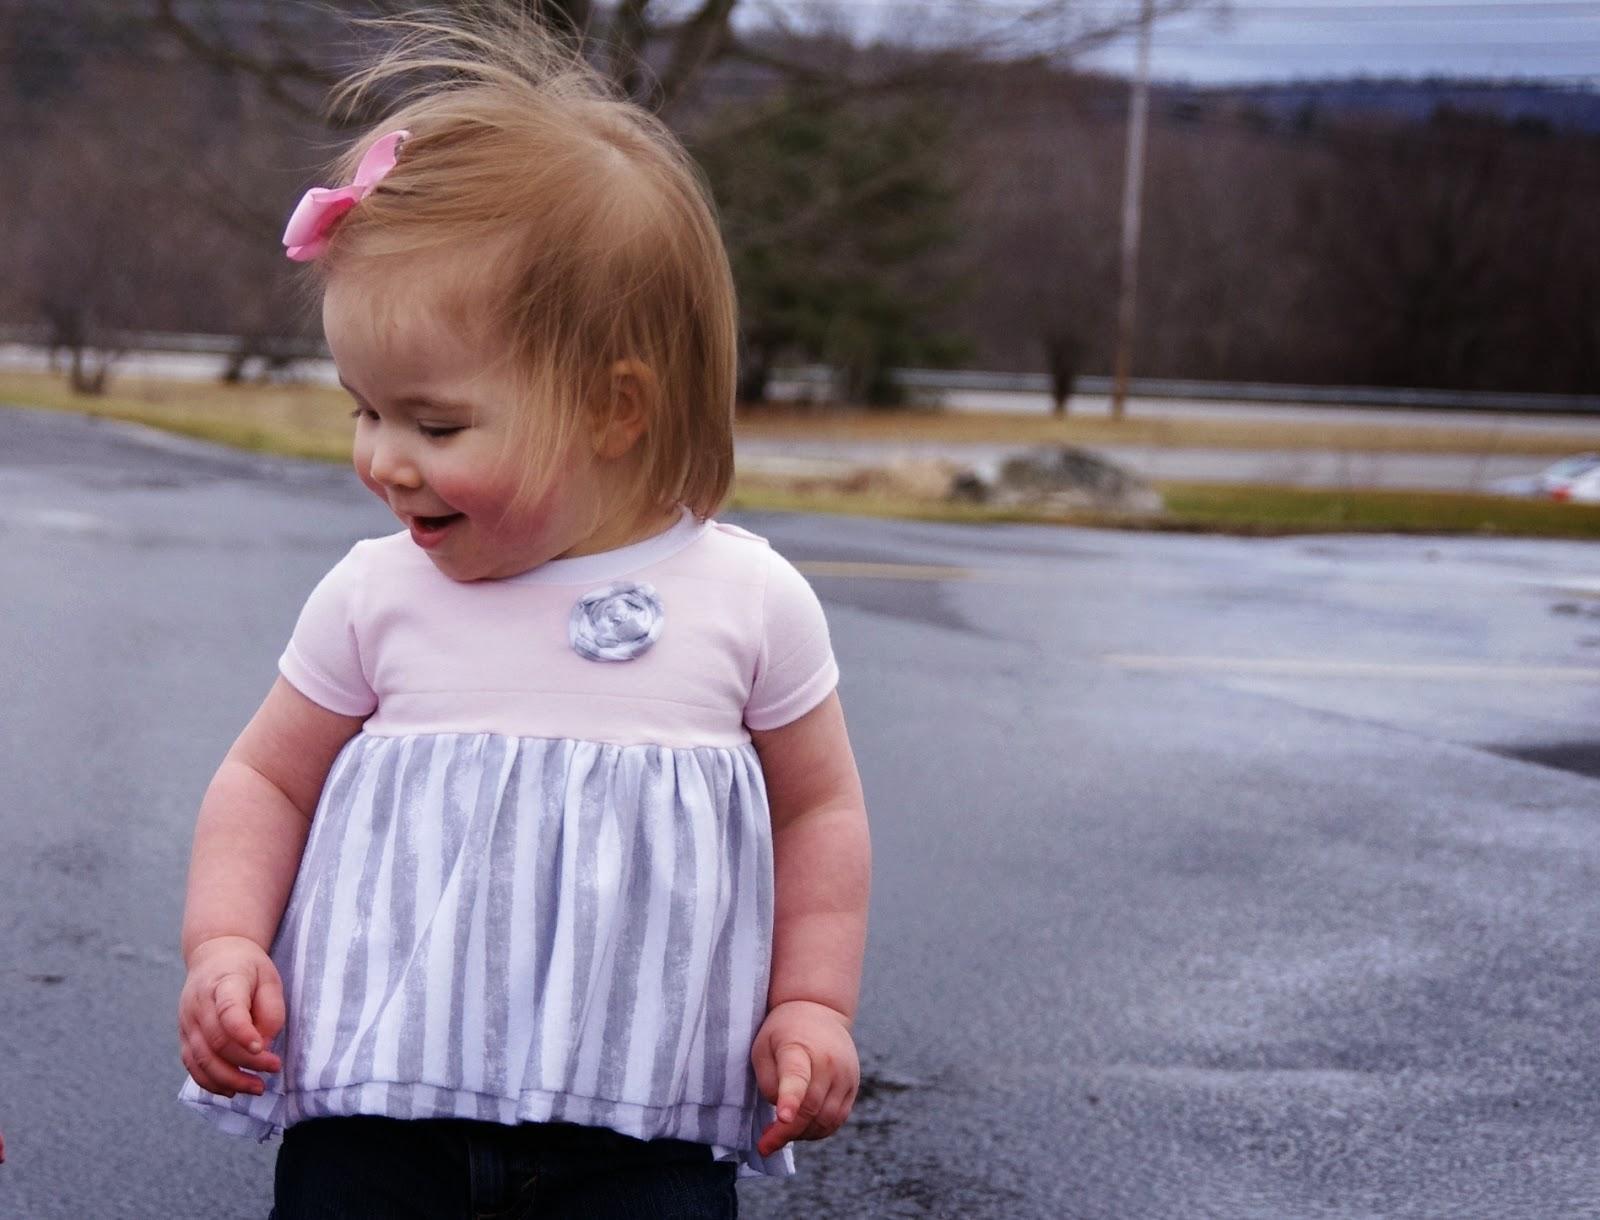 http://babysweetness.wordpress.com